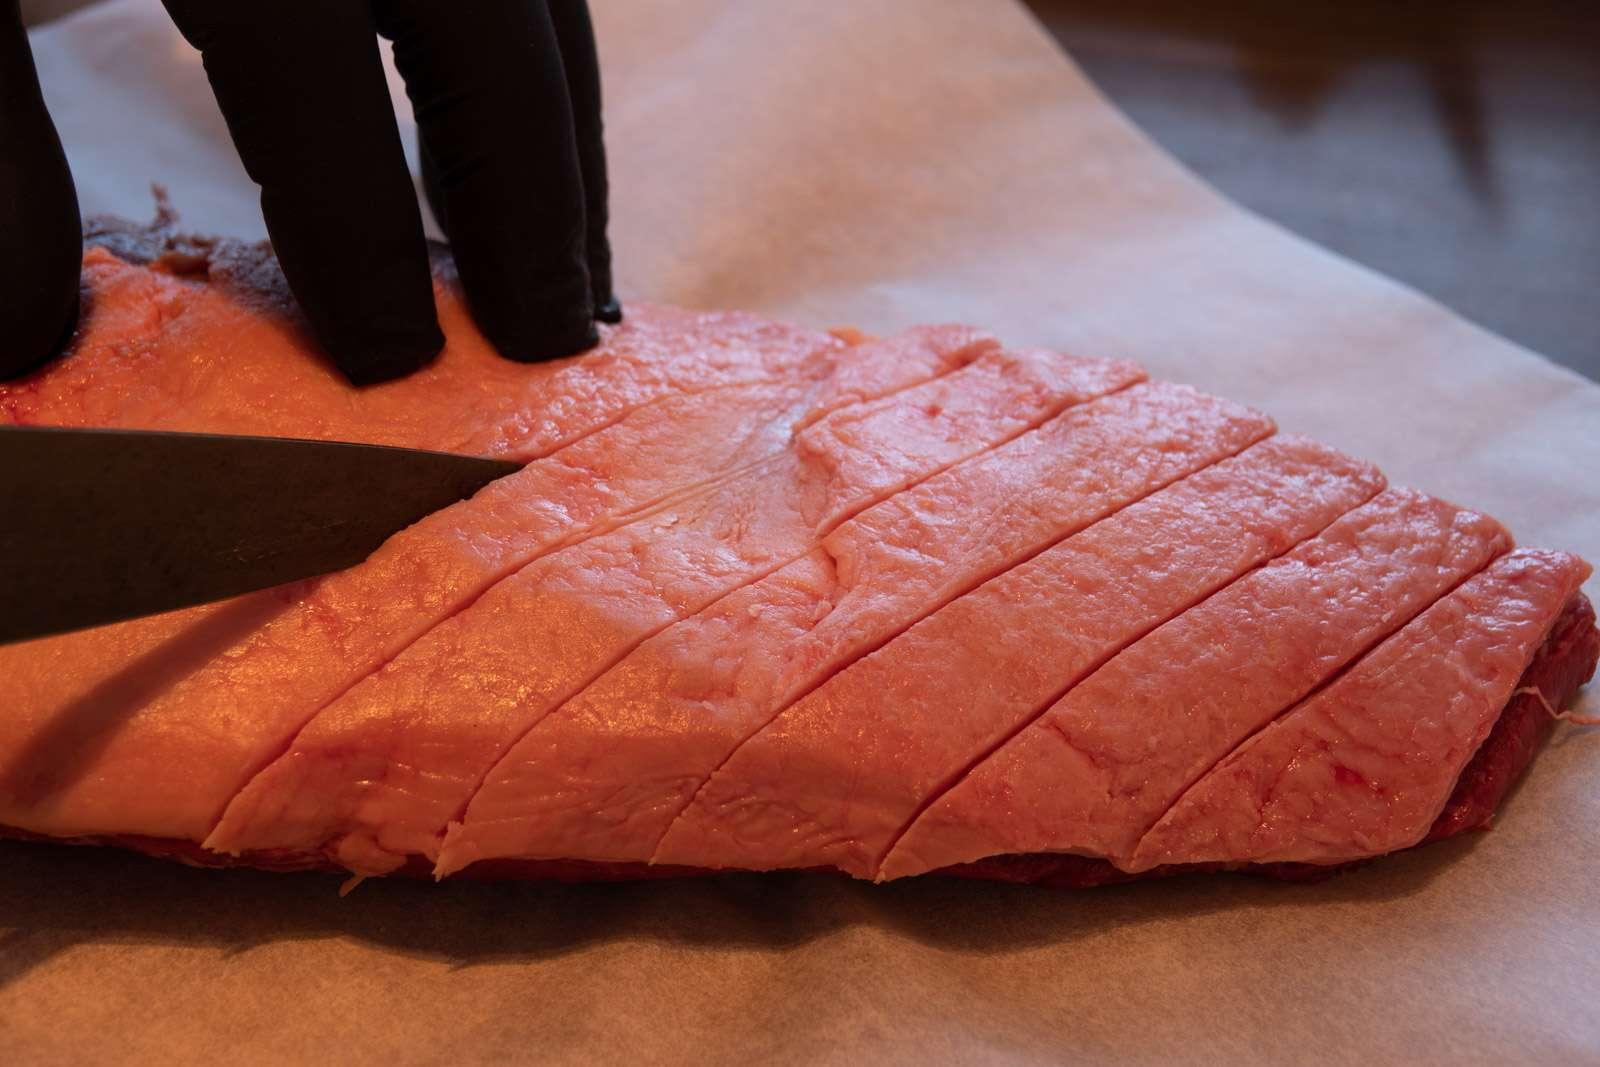 Recept | Perfecte Picanha | Kruislings insnijden | Rookplankje.nl